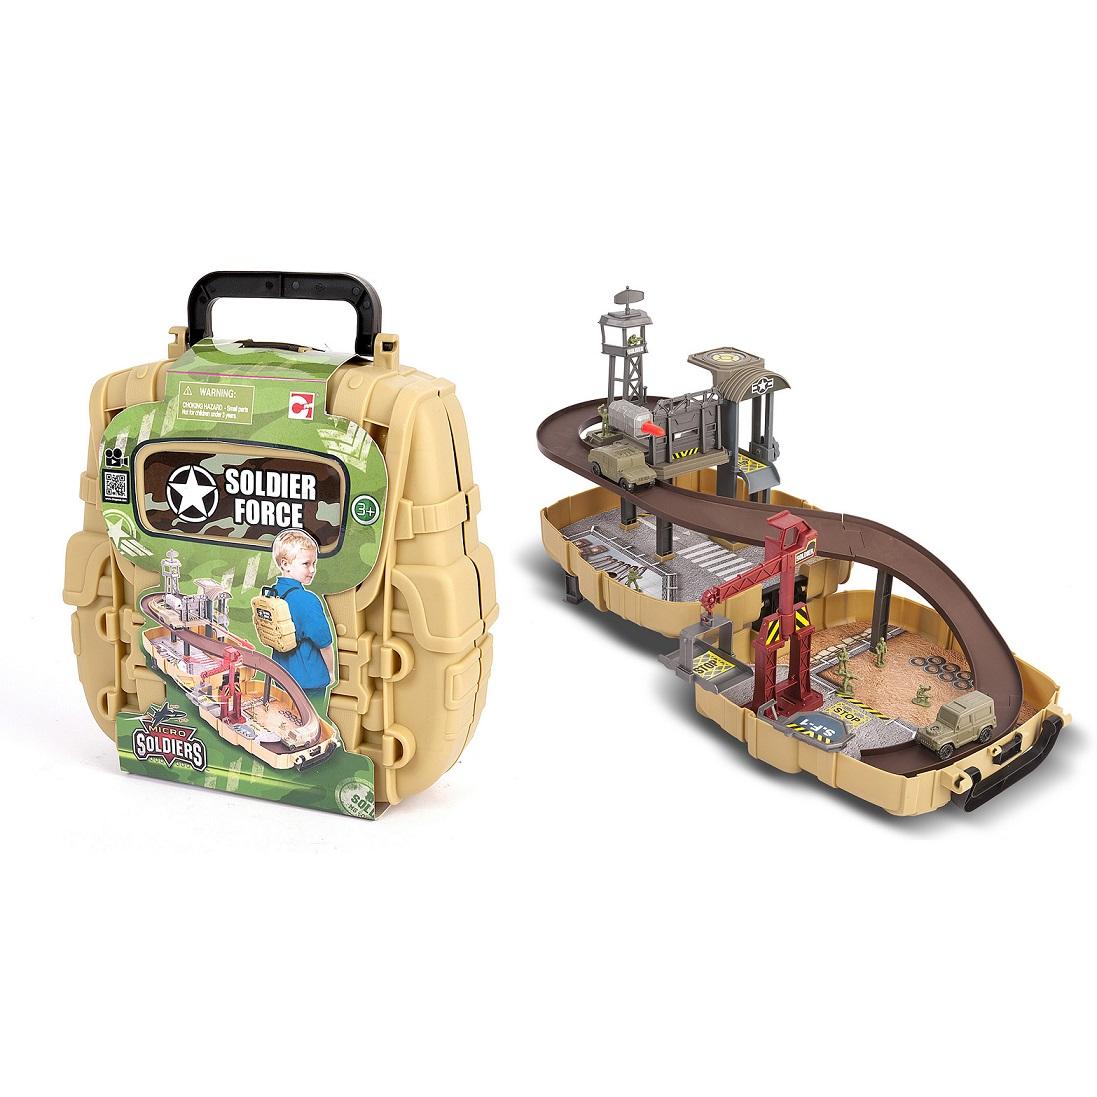 Игровой набор: Нано-Армия, мини трек в рюкзаке с наполнениемАвтотреки и авторалли<br>Игровой набор: Нано-Армия, мини трек в рюкзаке с наполнением<br>